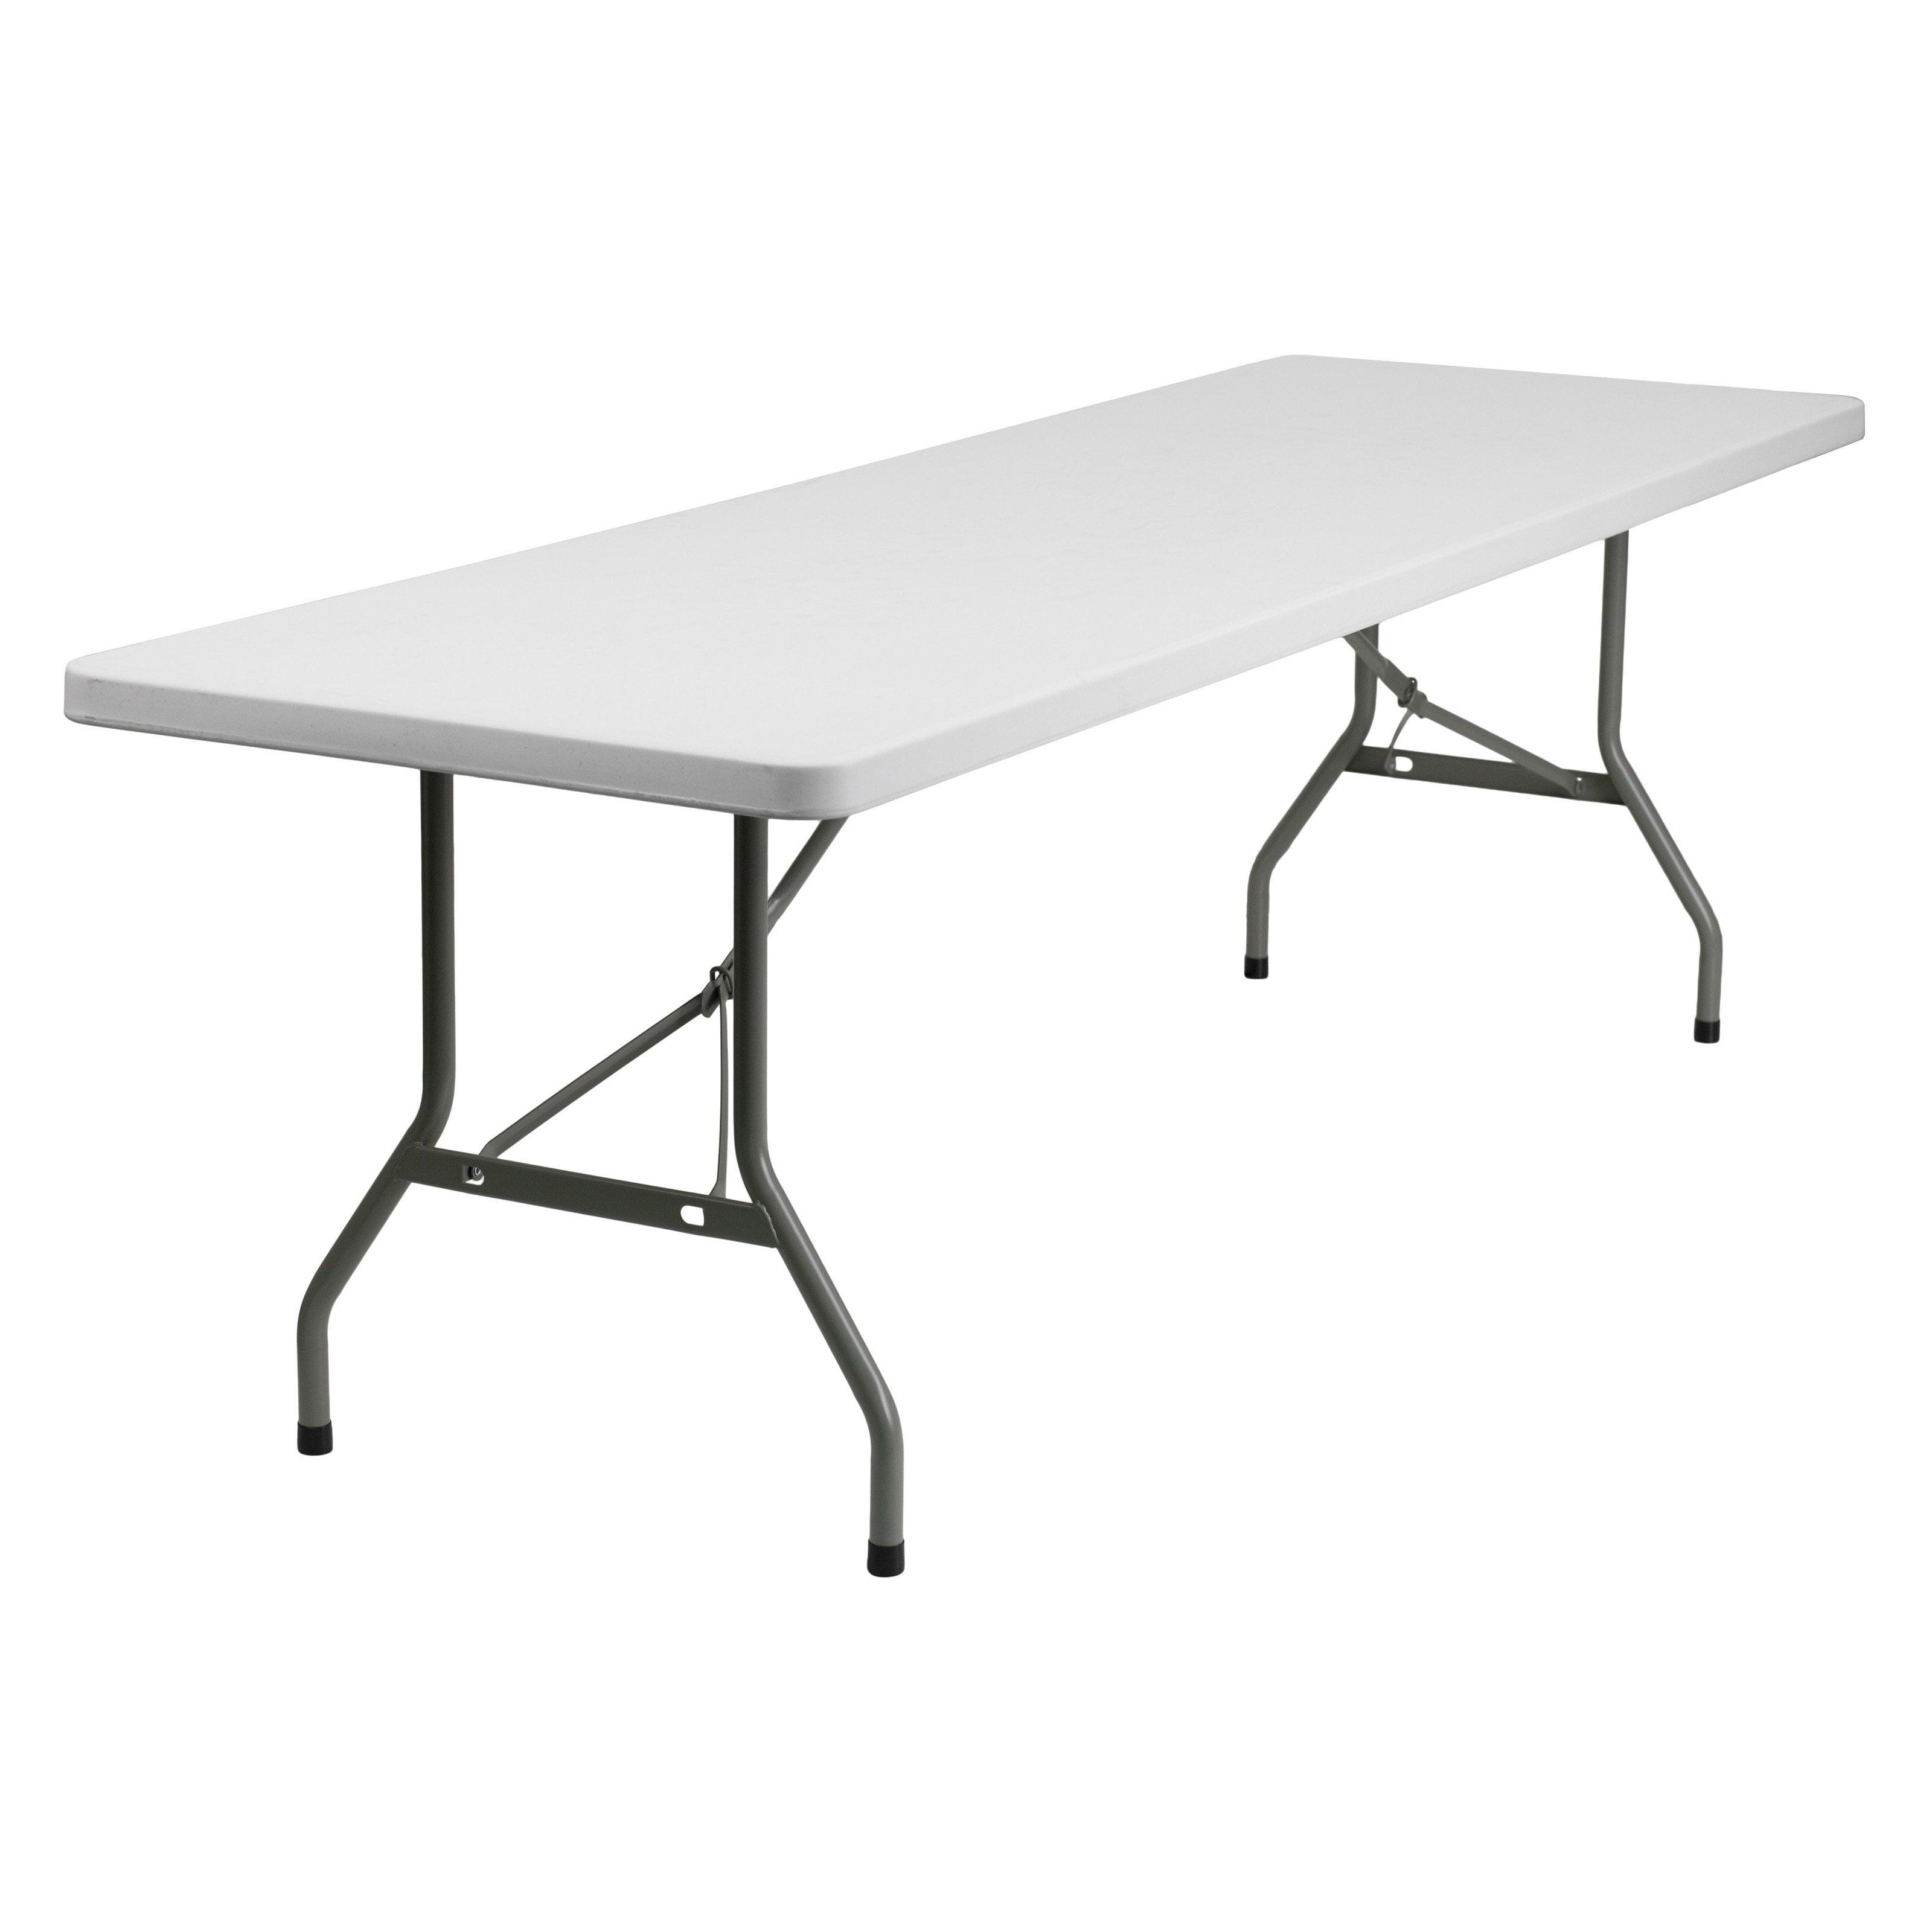 Flash Furniture 30''W x 96''L Granite White Plastic Folding Table by Flash Furniture